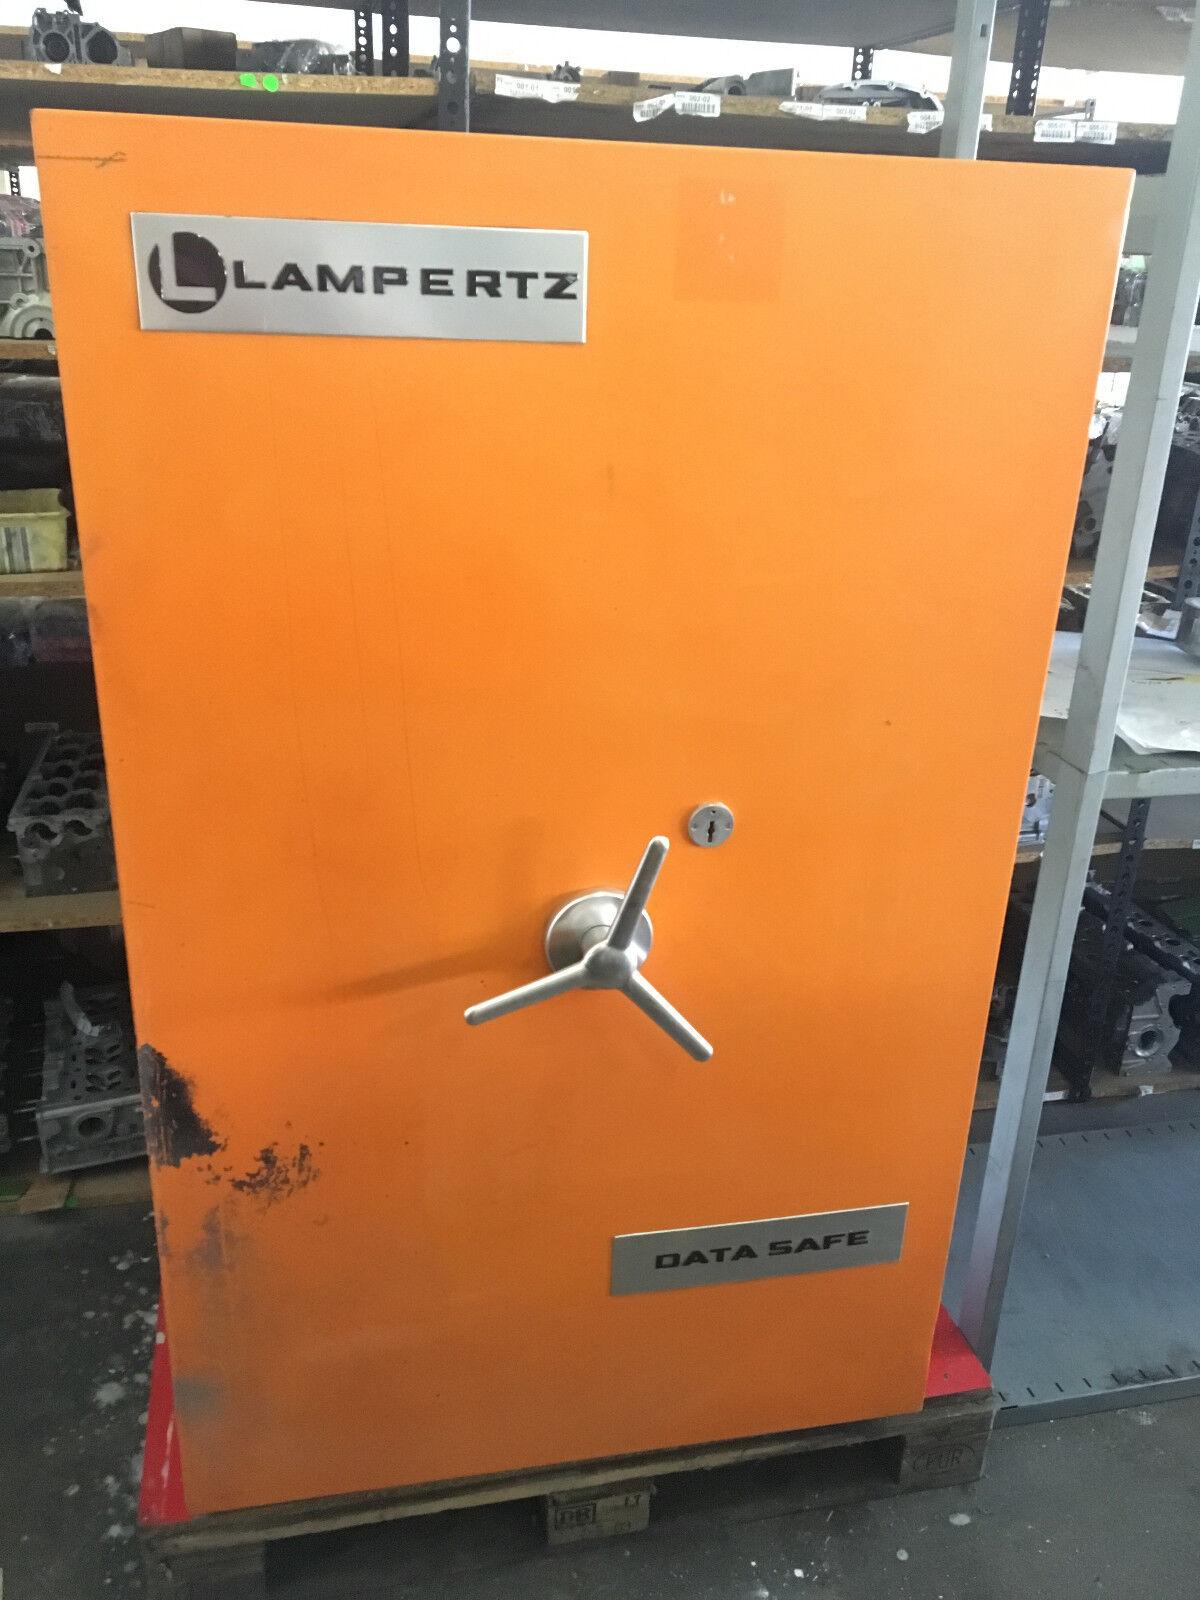 Tresor / Safe / Datensicherung / Sicherung / Diebstahlschutz - LAMPERTZ S60 D